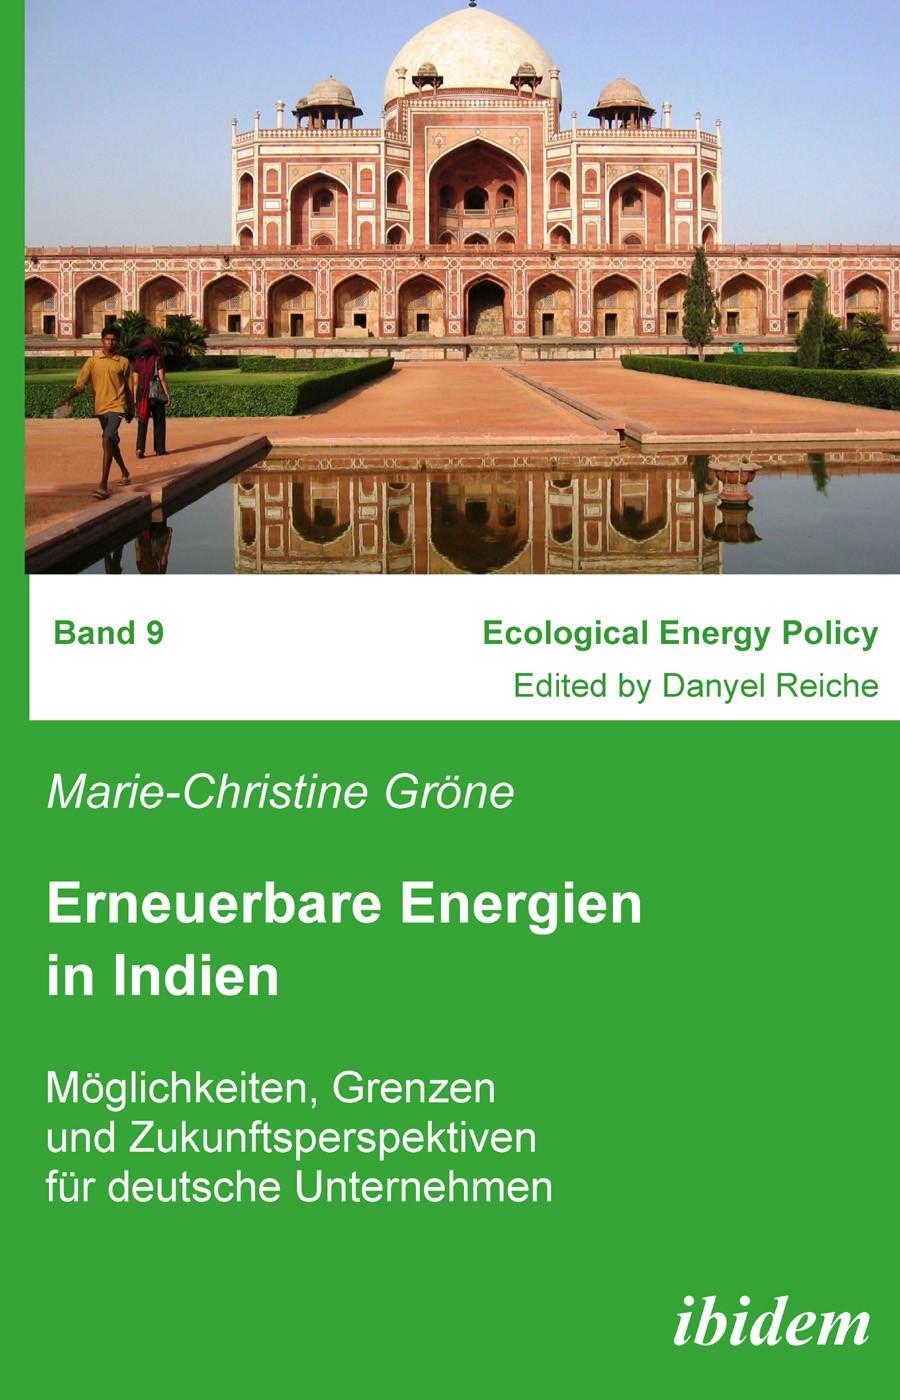 Erneuerbare Energien in Indien